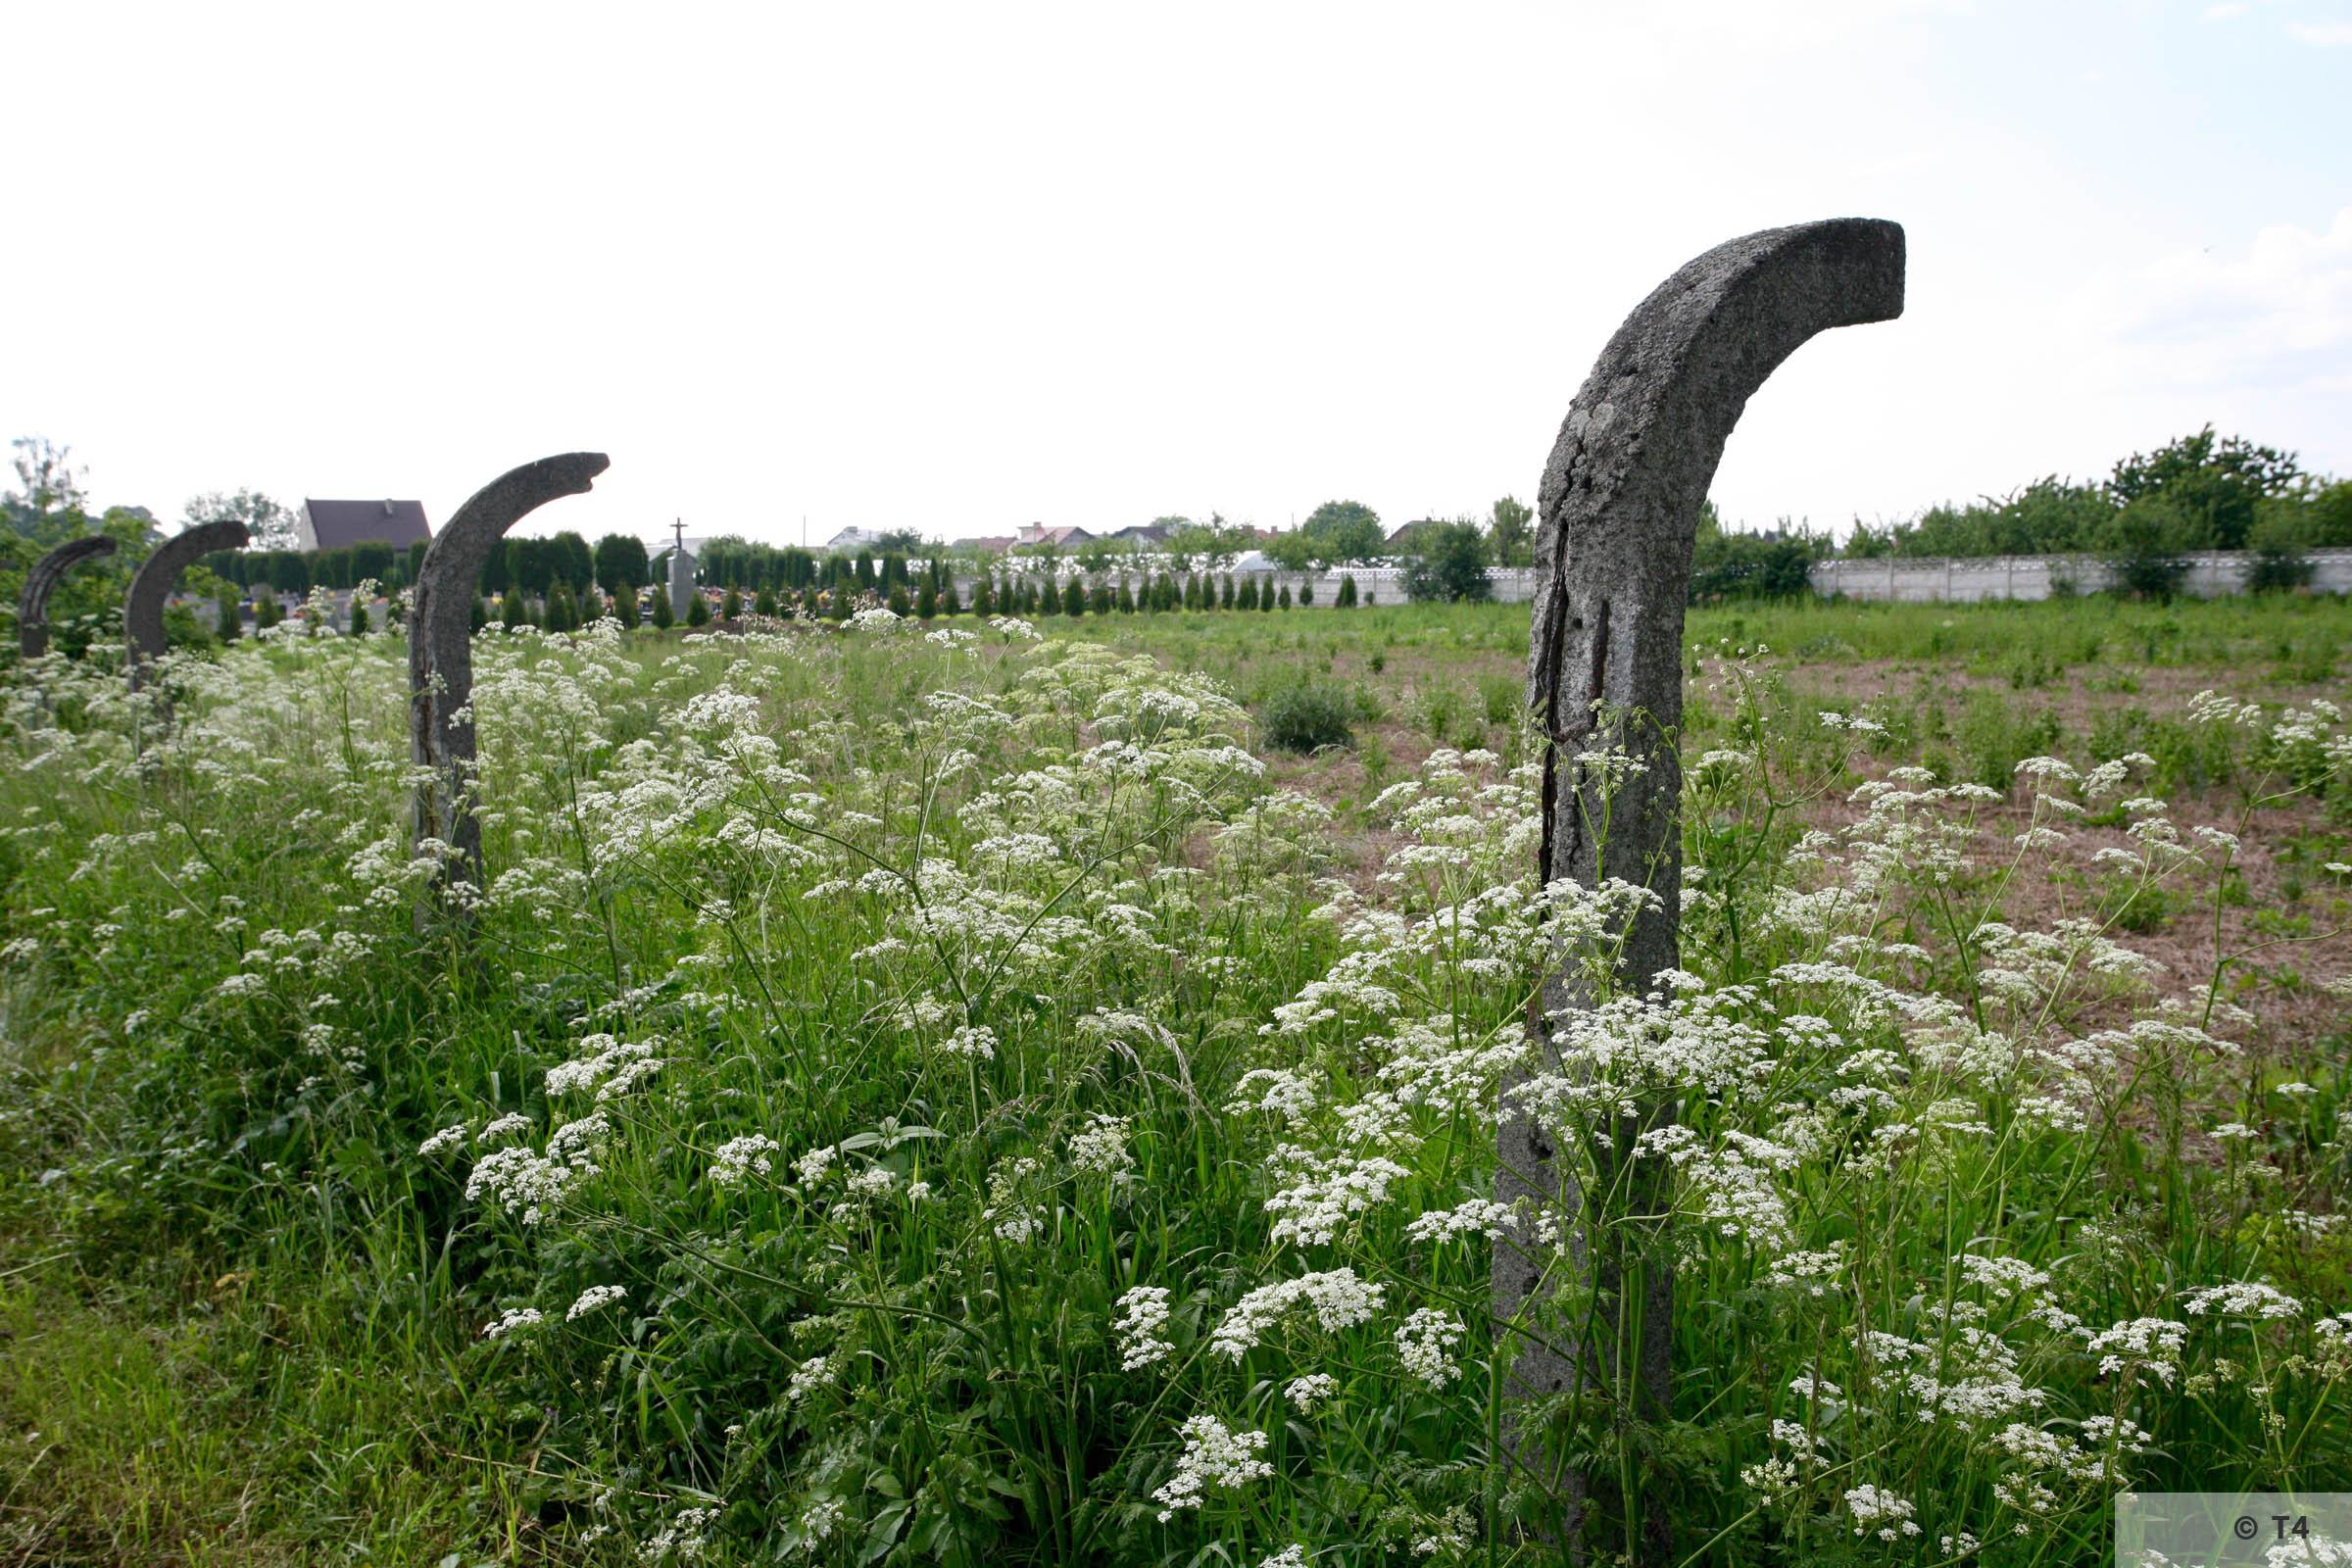 Fence posts surrounding field in Rajsko. 2006 T4 5038